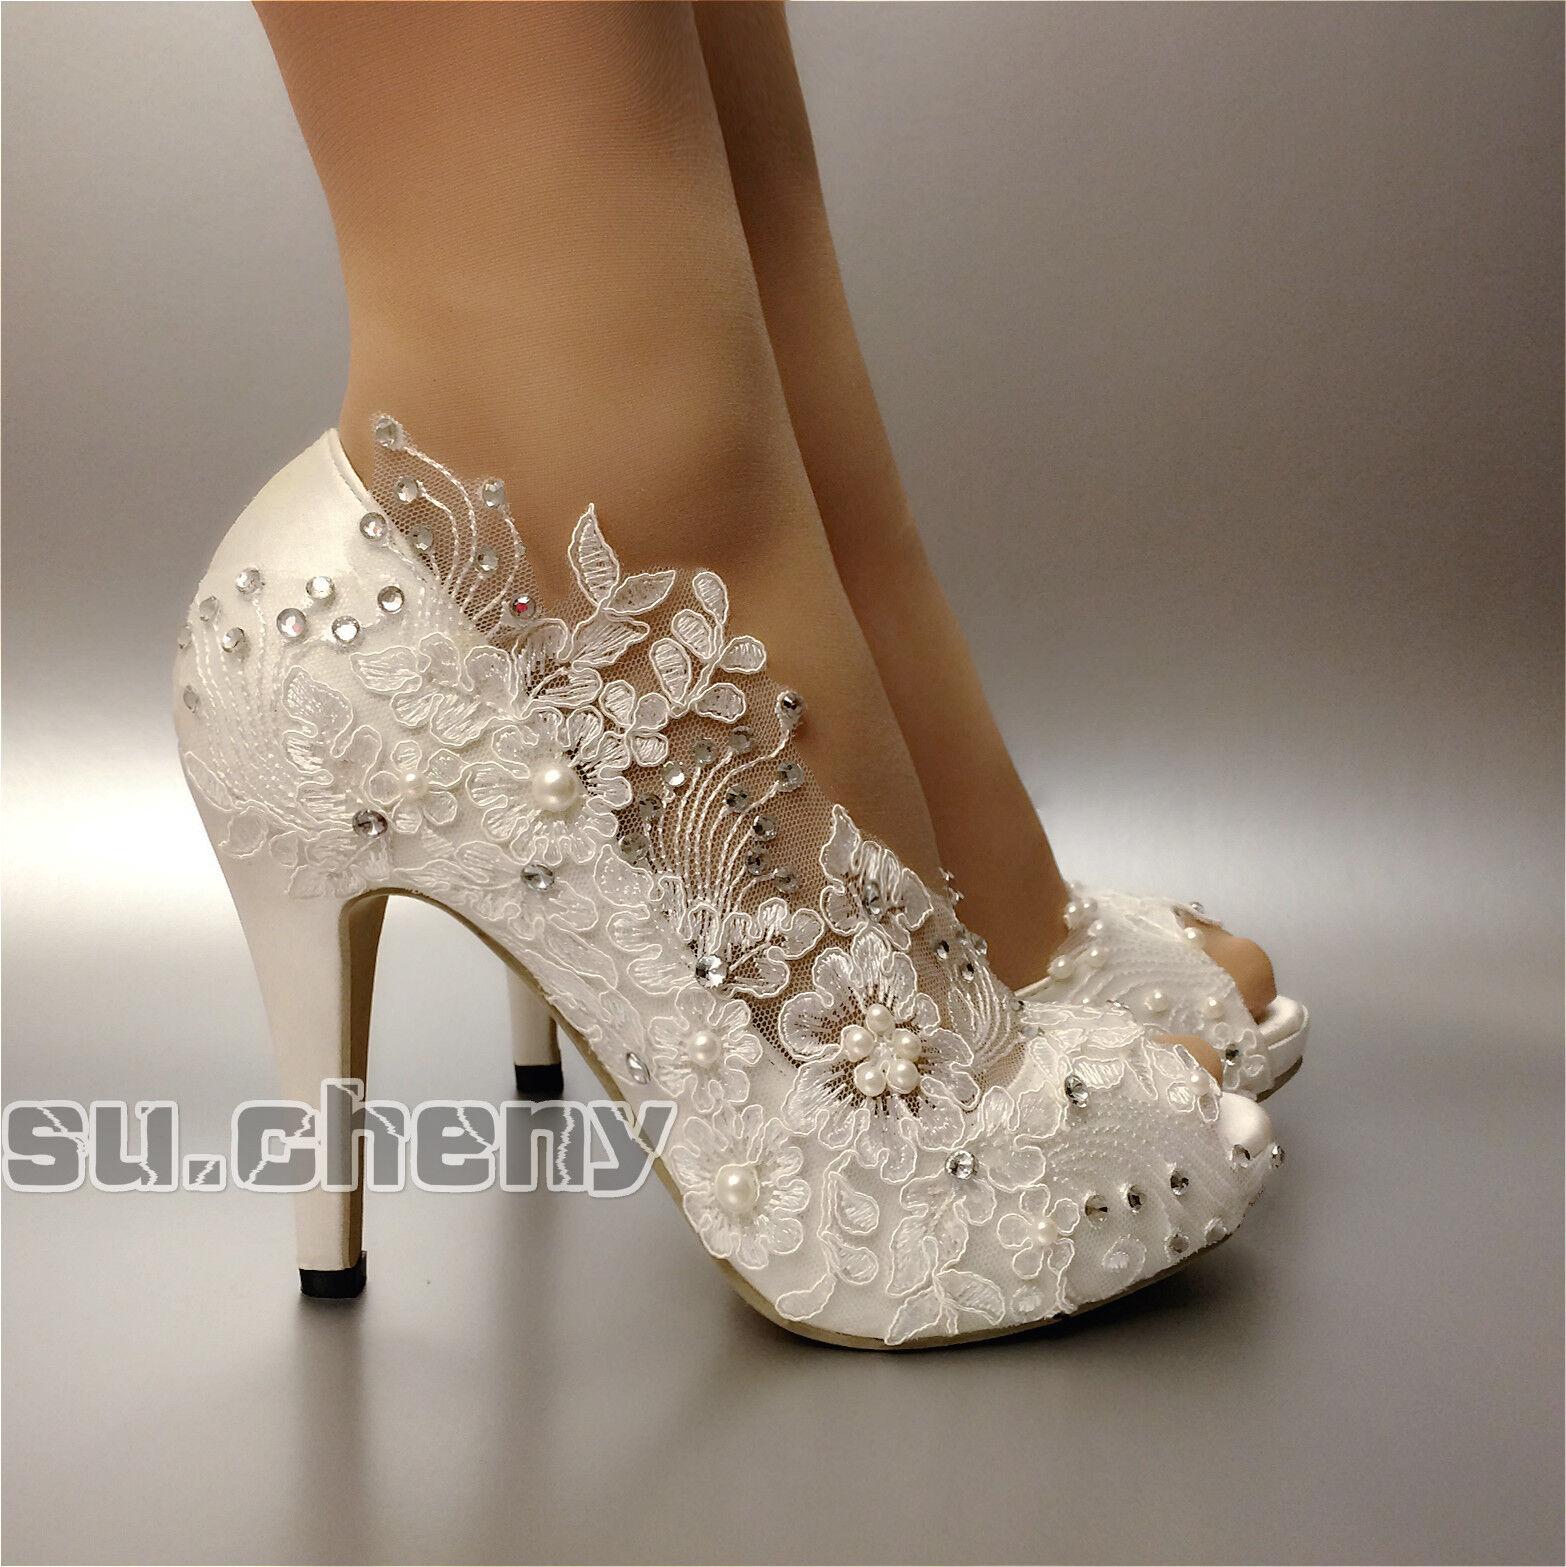 Heels satin Weiß ivory schuhe lace Gypsophila open toe Wedding schuhe ivory bride Größe 5-11 f44dfc